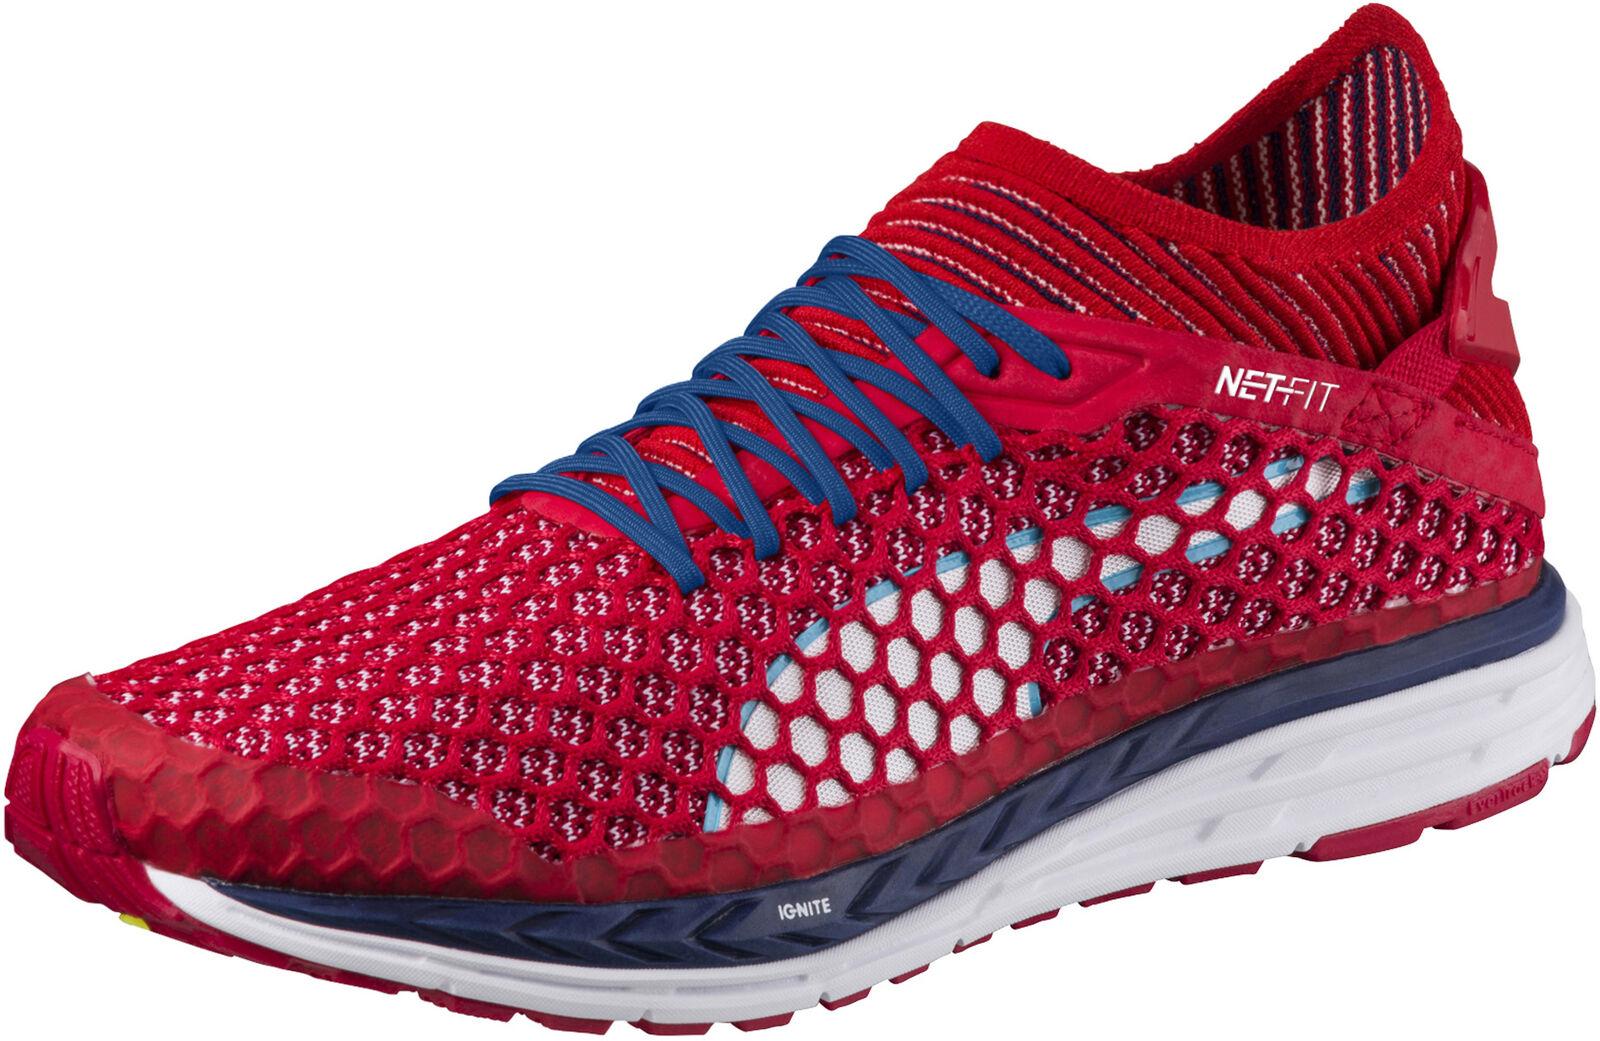 Puma Speed Ignite Netfit Mens Running shoes - Red